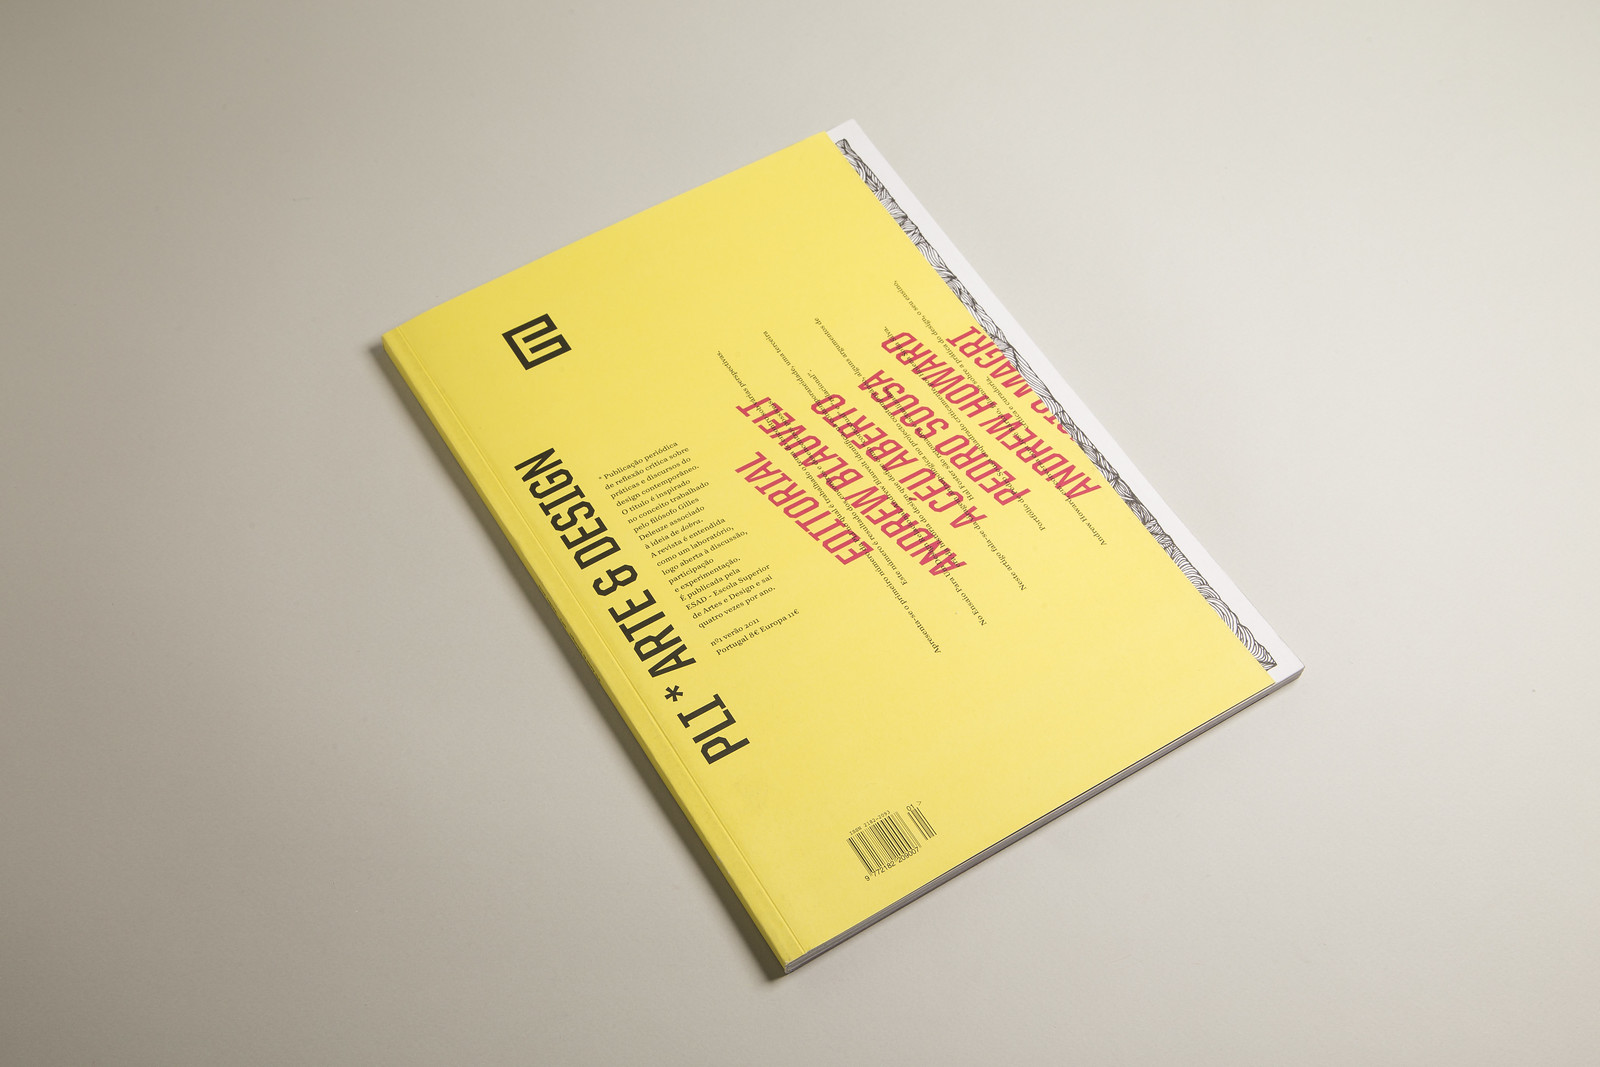 PLI arte + design — Encontro/Entusiasmo